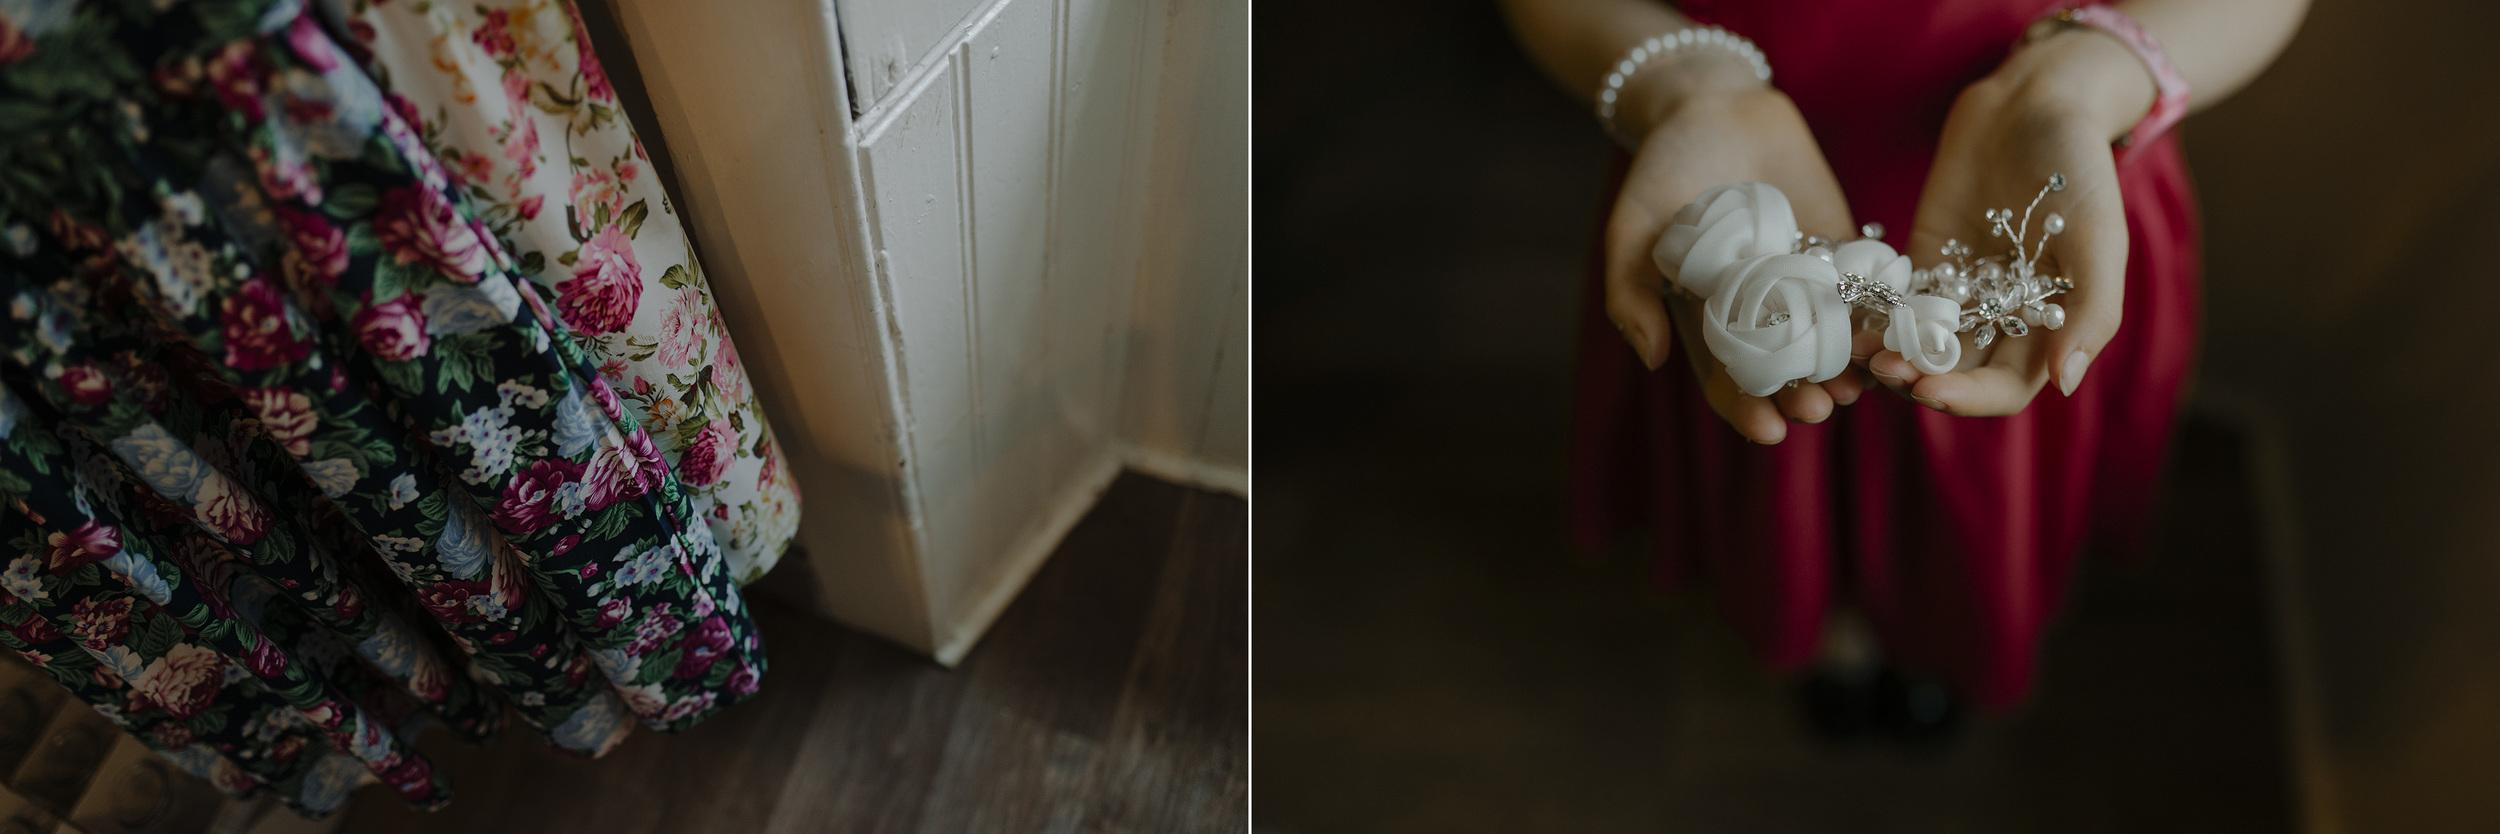 Comrie Croft Wedding Photography 7.jpg